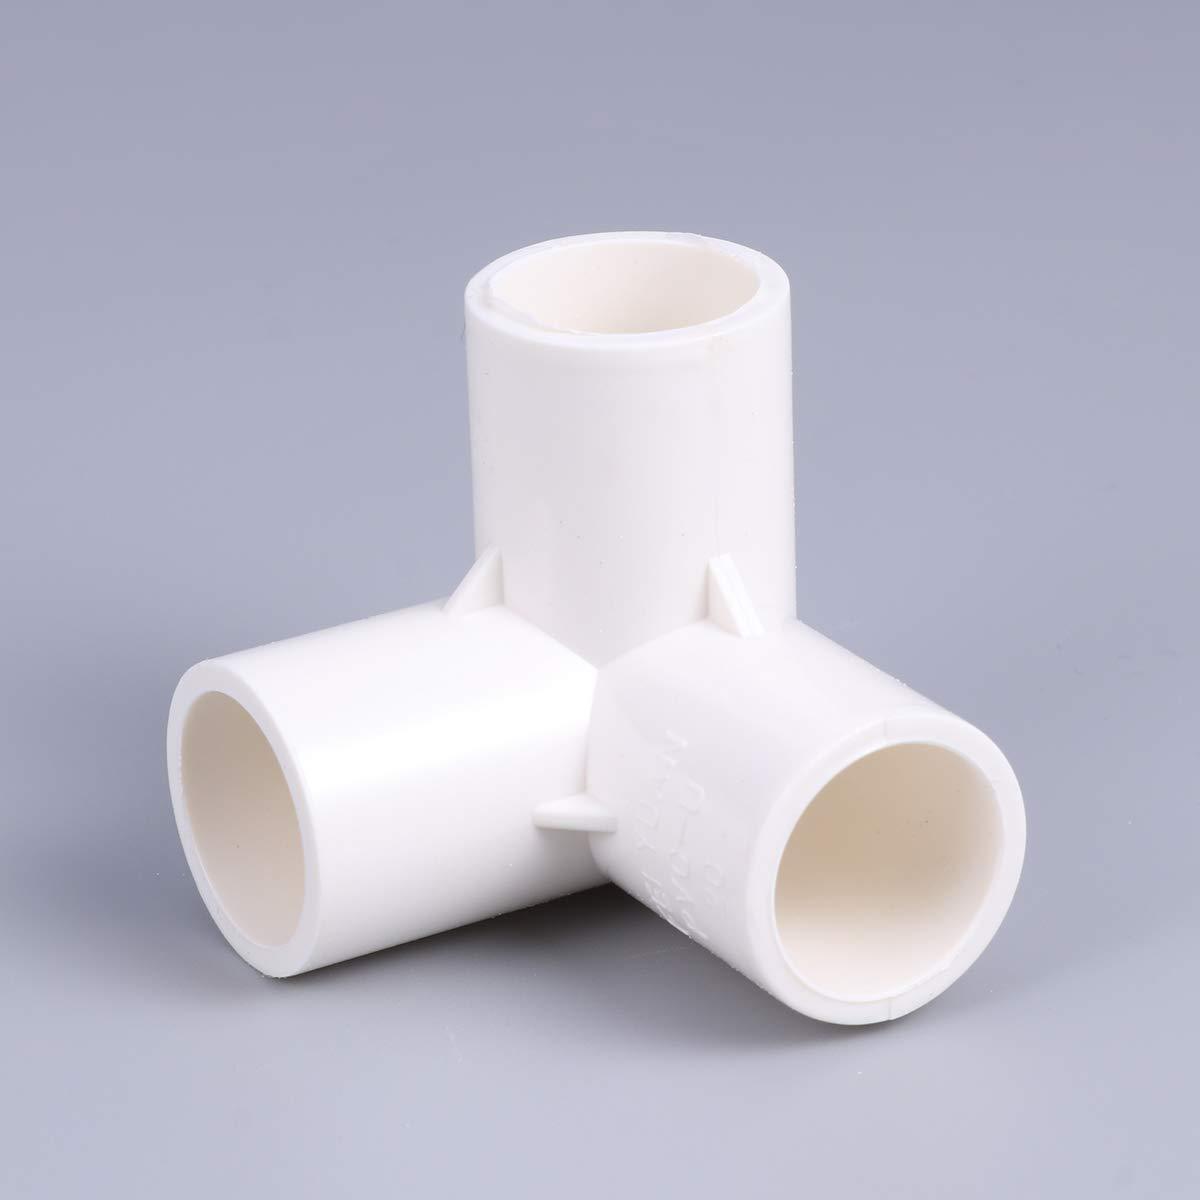 Yardwe 10pcs joint /à 3 voies raccord de raccord de tube de tuyau deau en PVC blanc